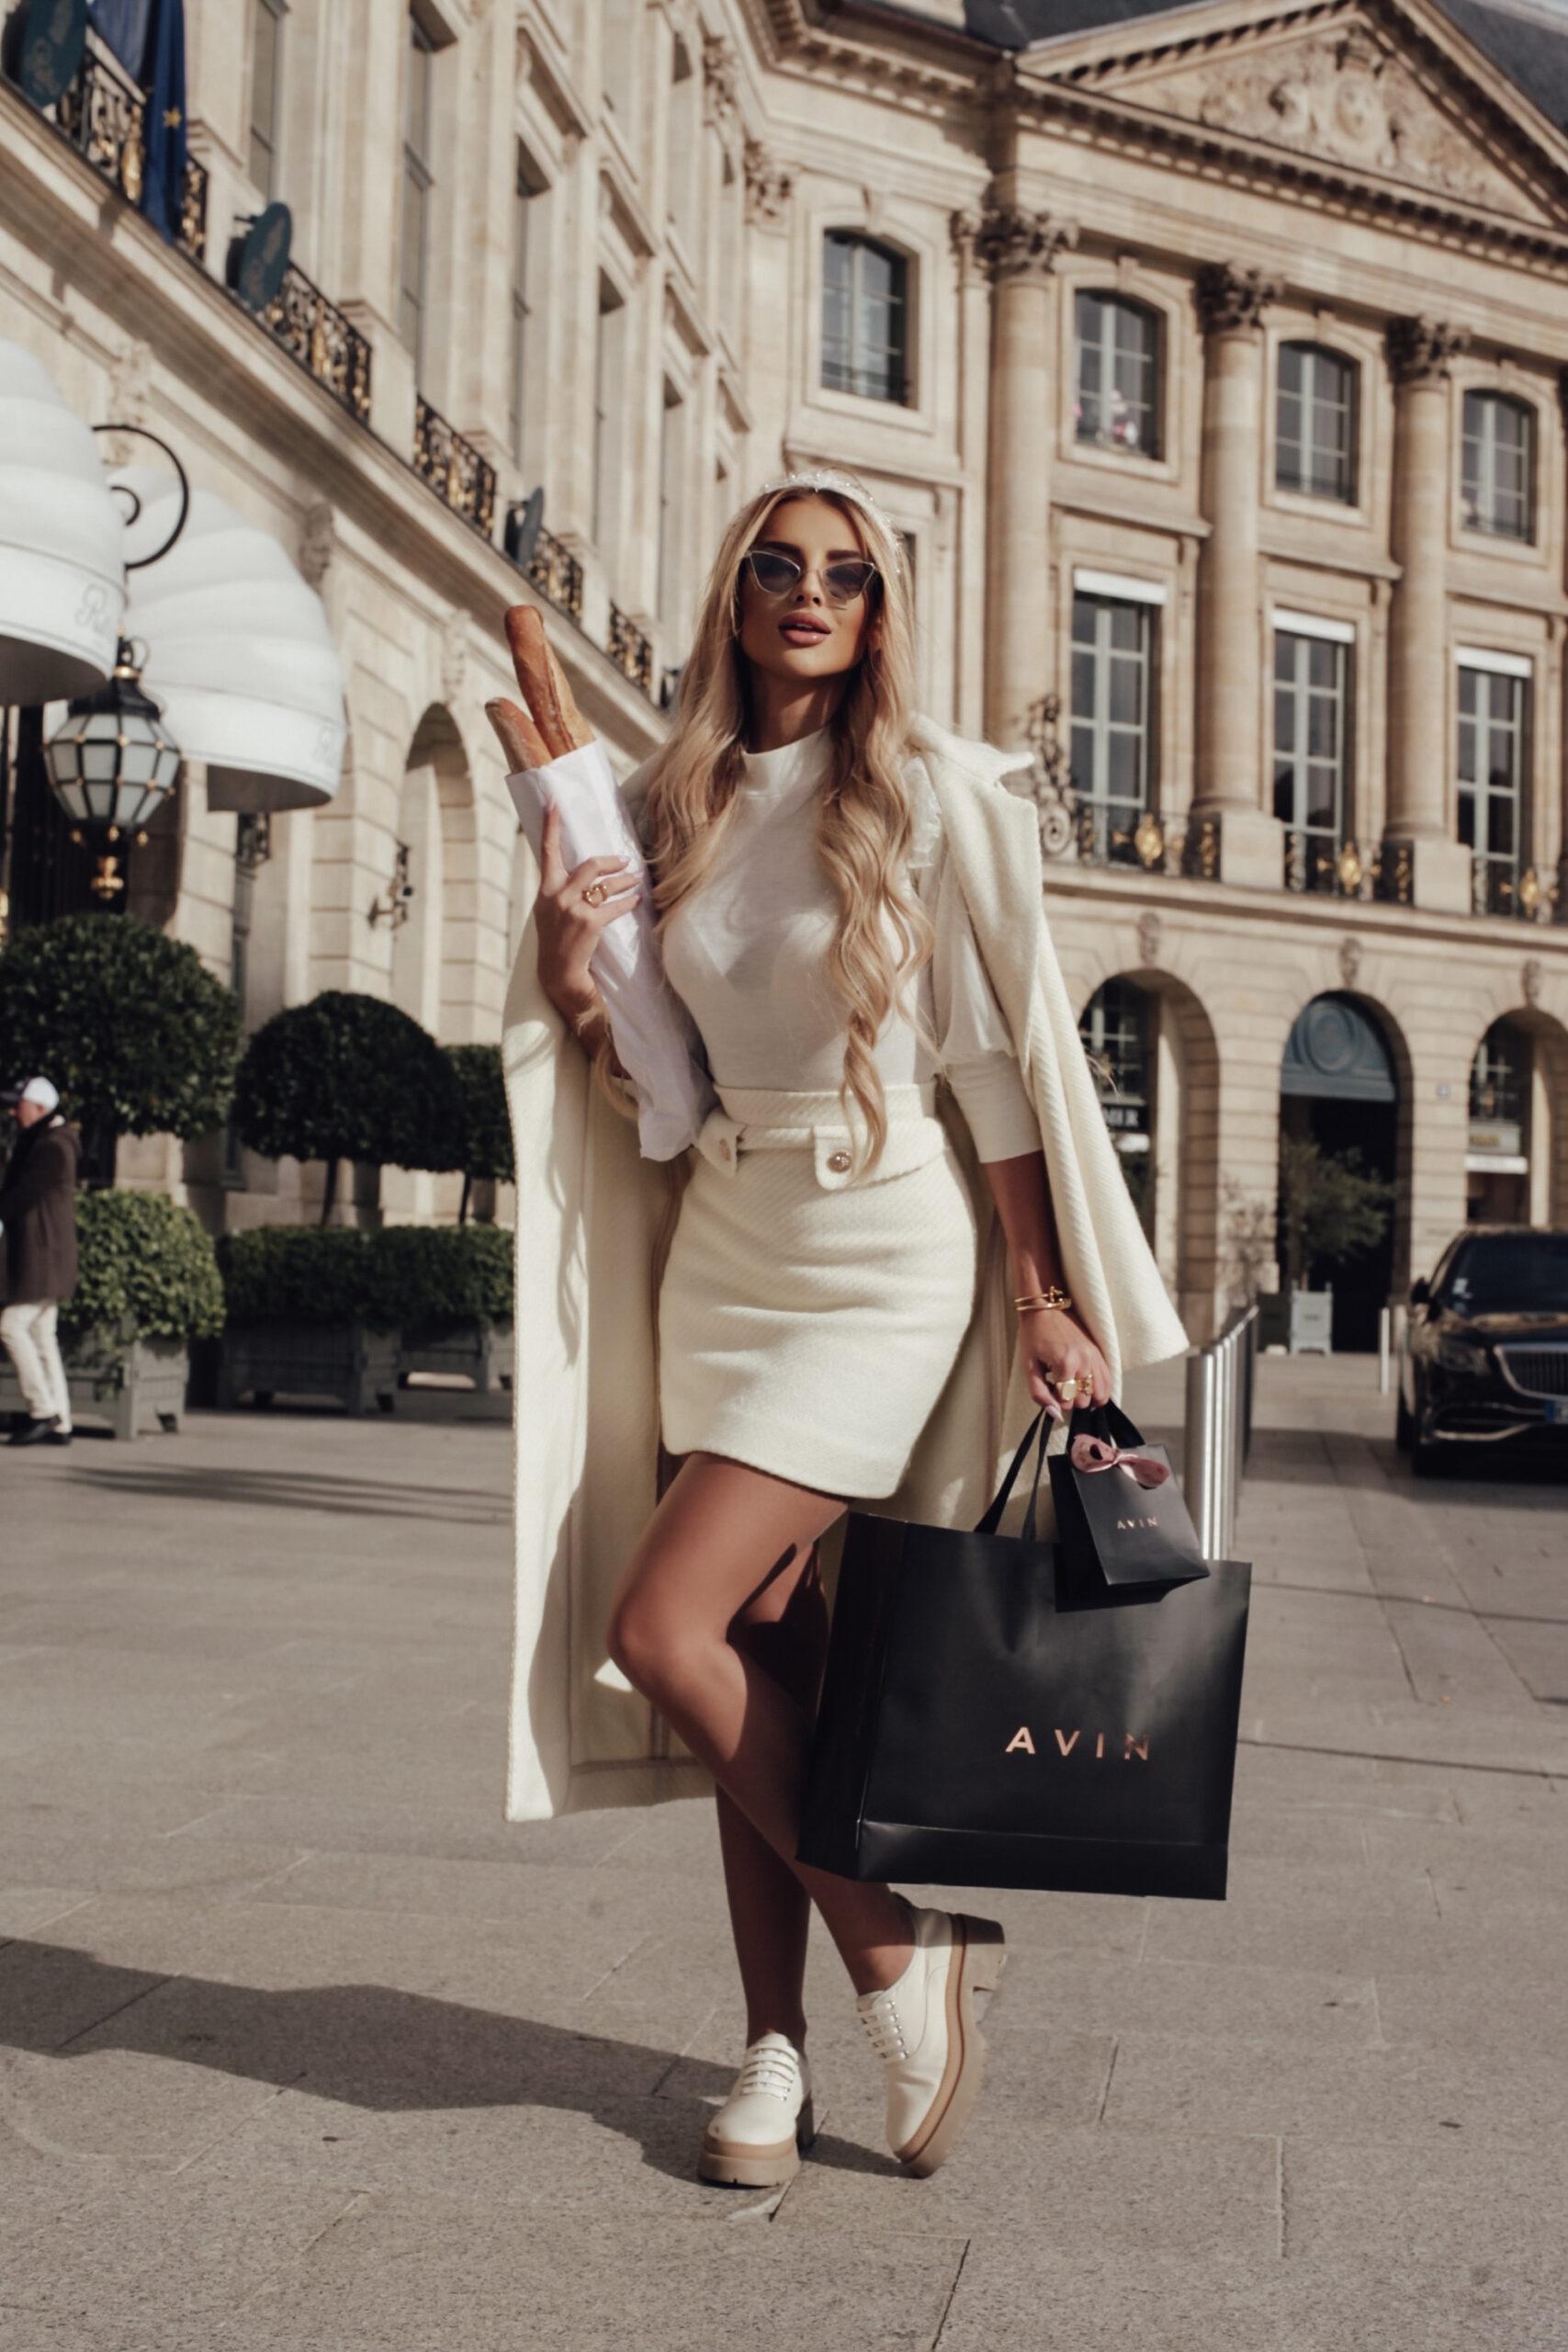 бутикови дизайнерски дрехи онлайн avin